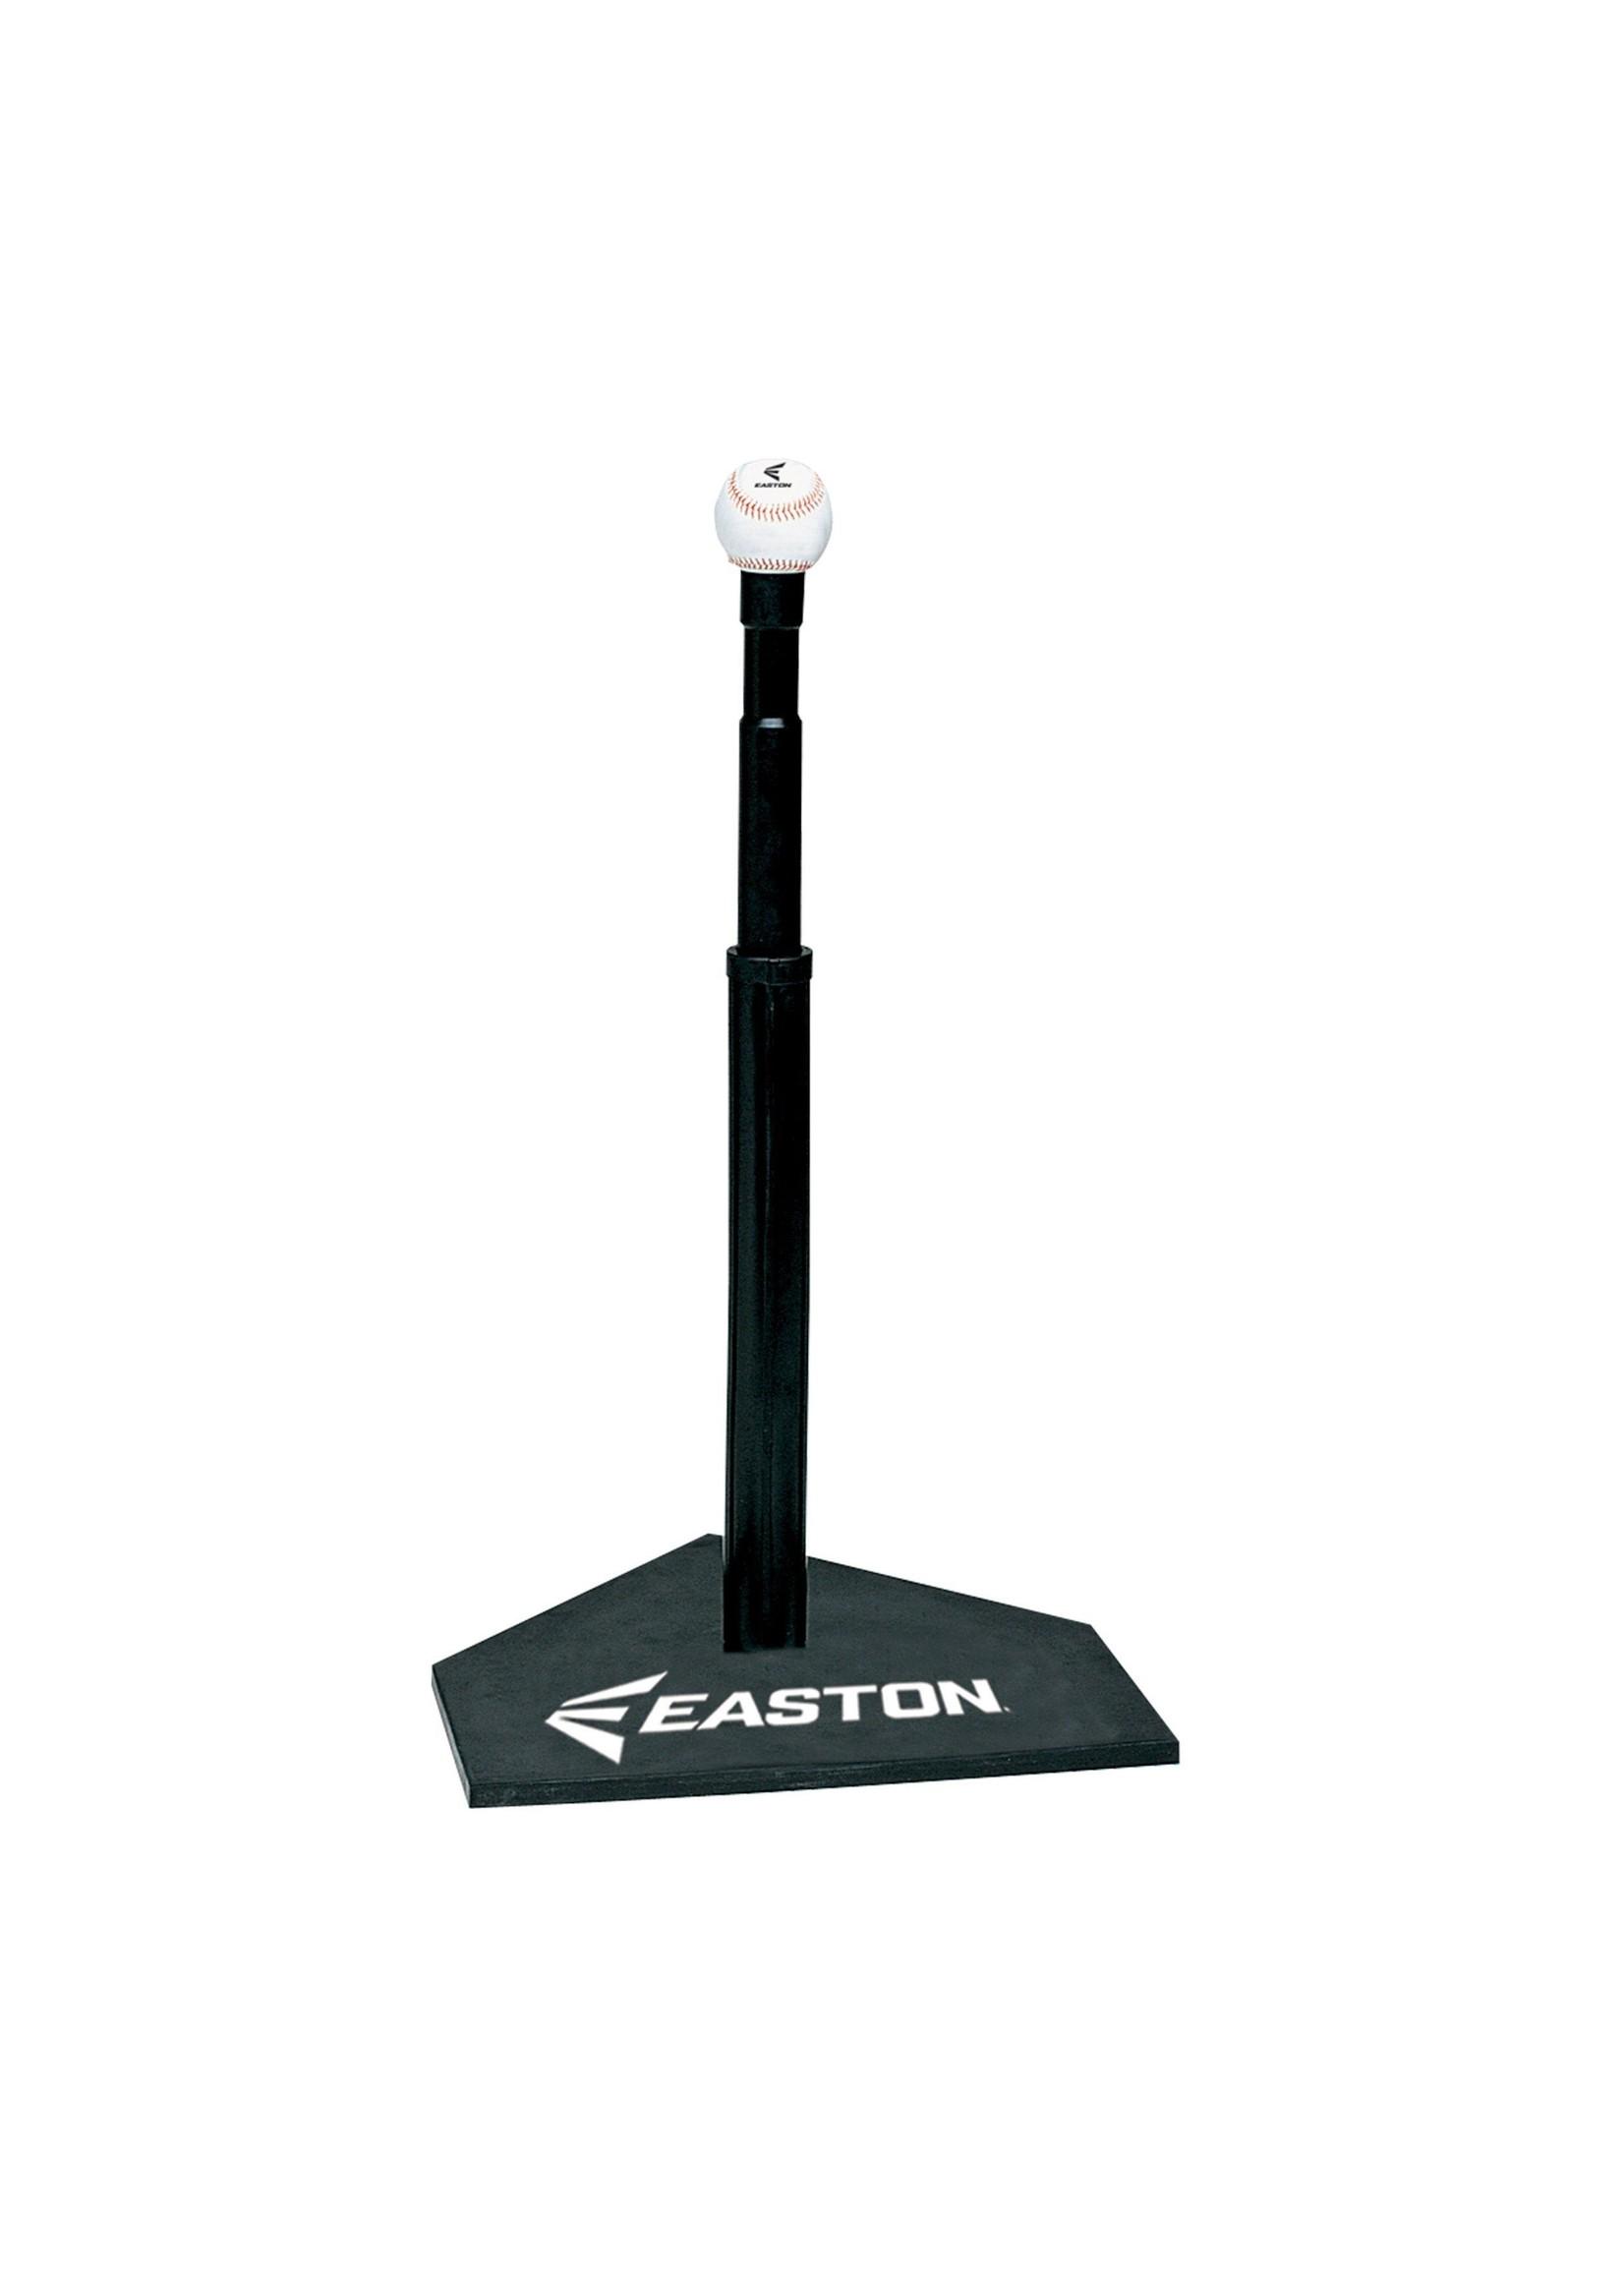 Easton Baseball (Canada) EASTON DELUXE BATTING TEE | BASEBALL SOFTBALL